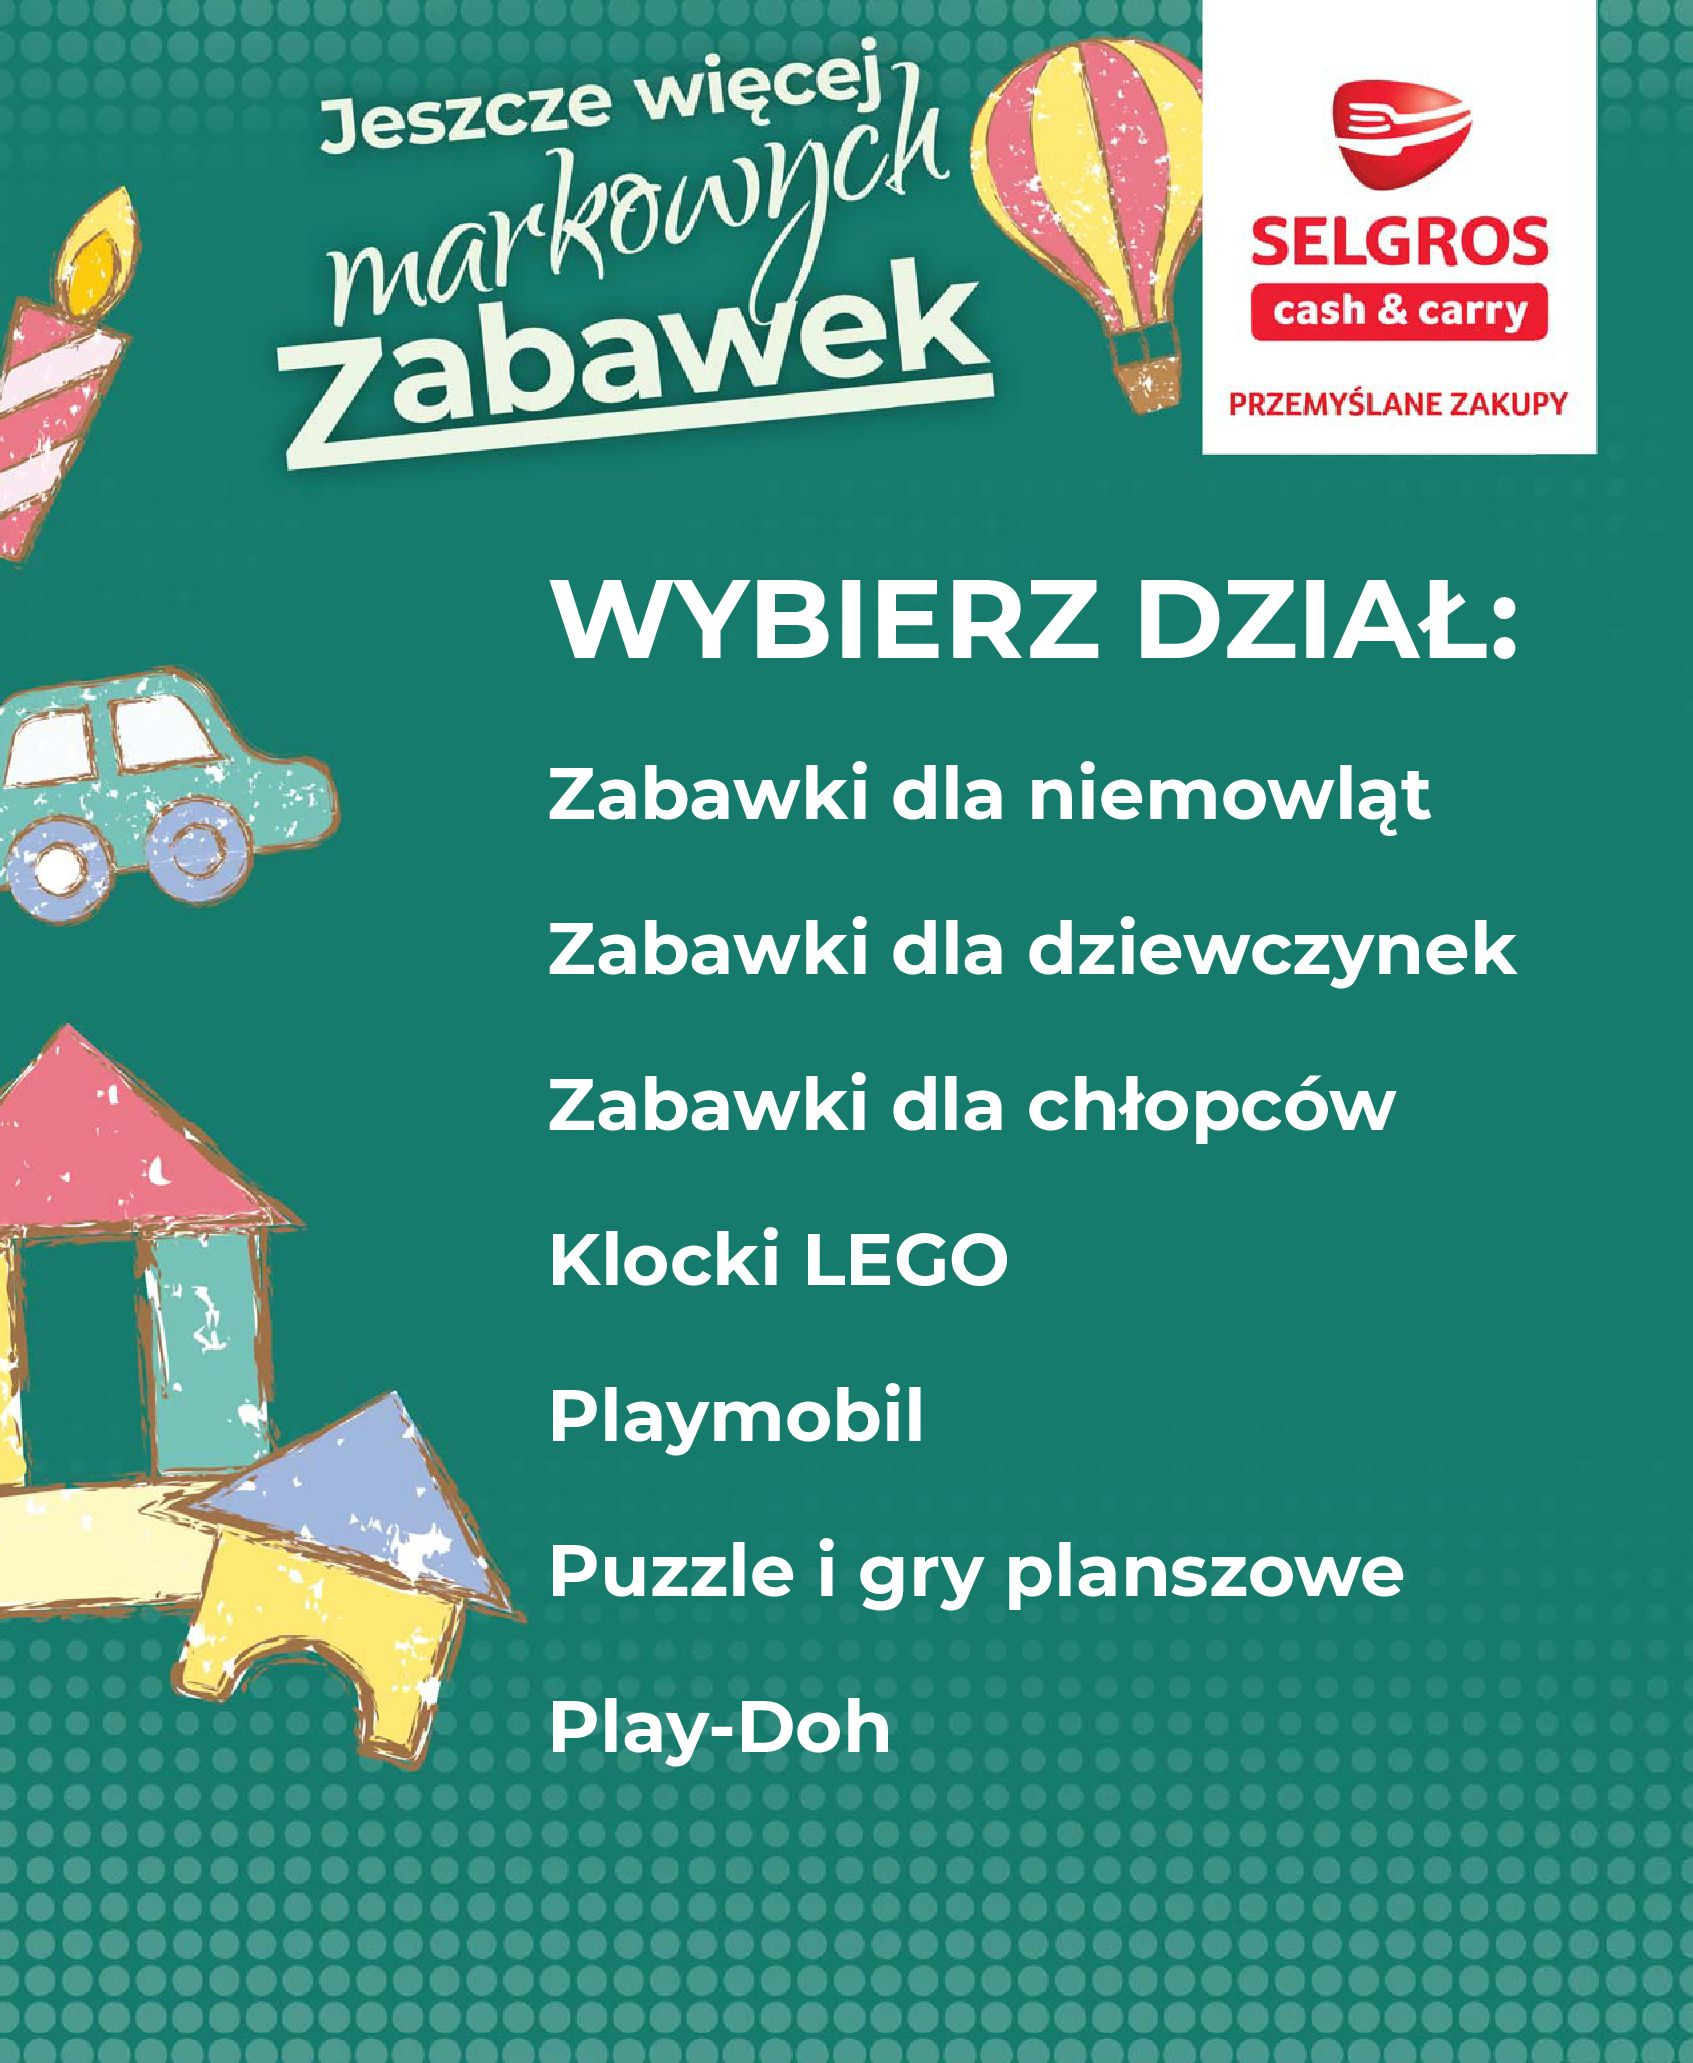 Gazetka Selgros - Katalog zabawek-20.11.2019-24.12.2019-page-2